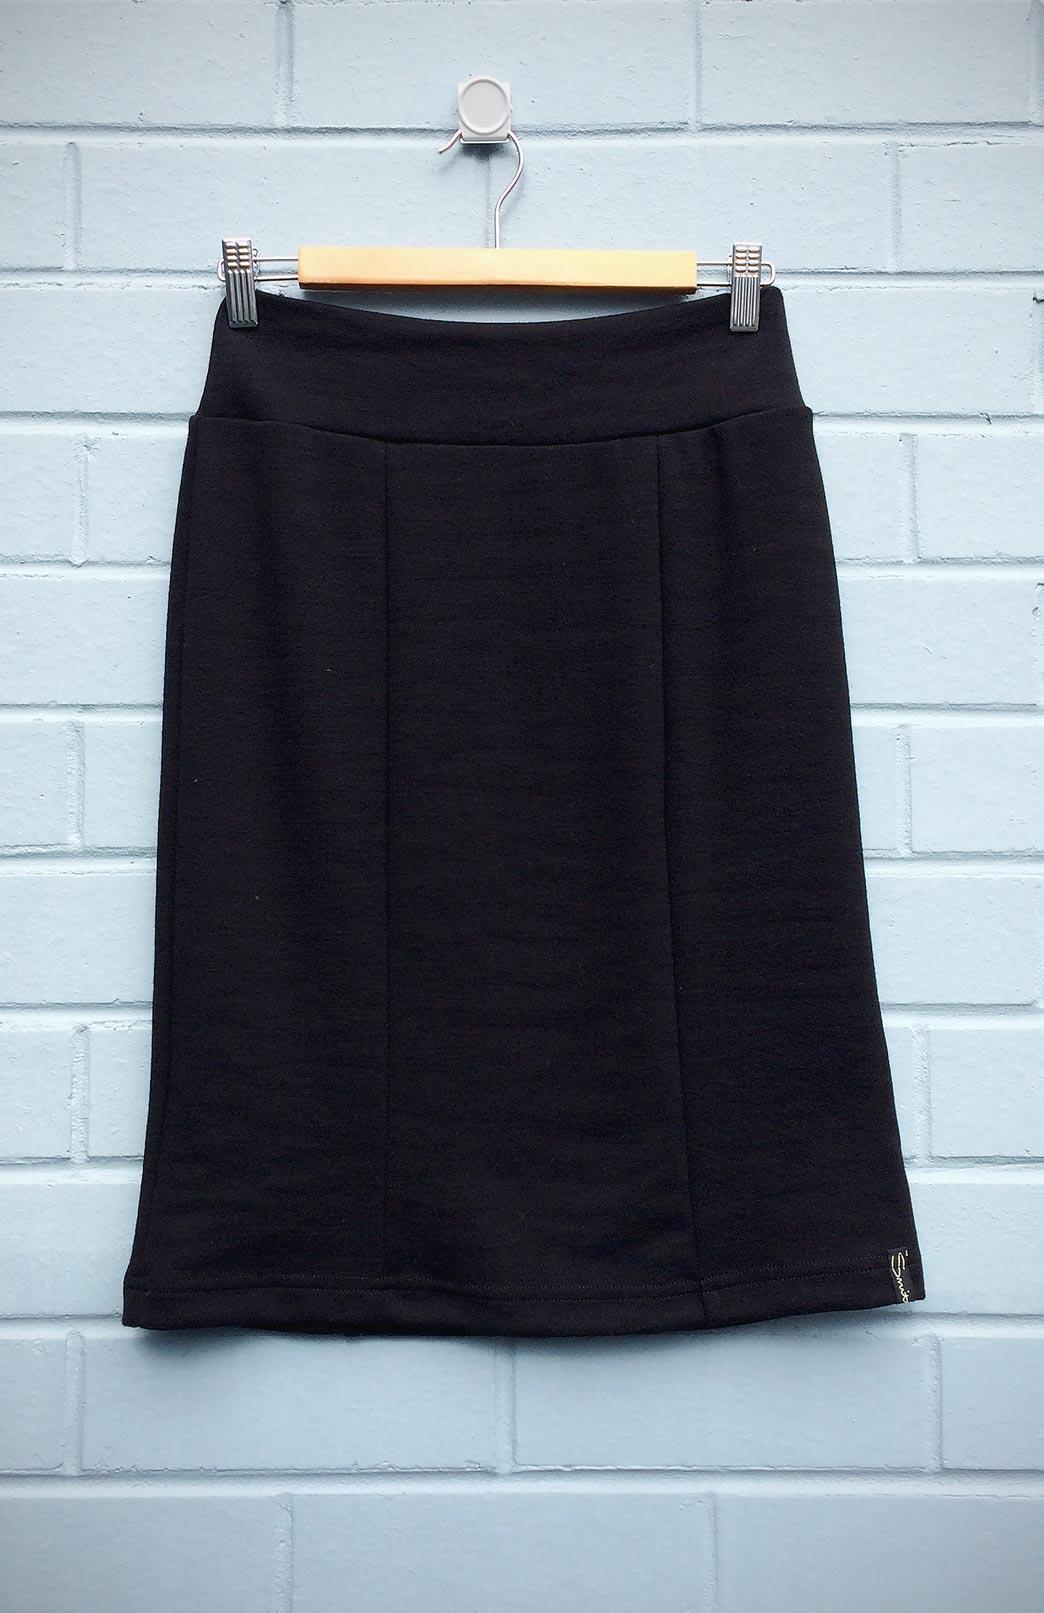 Straight Skirt (Seconds) - Women's Pull-On Black Ponte Merino Wool Skirt - Smitten Merino Tasmania Australia